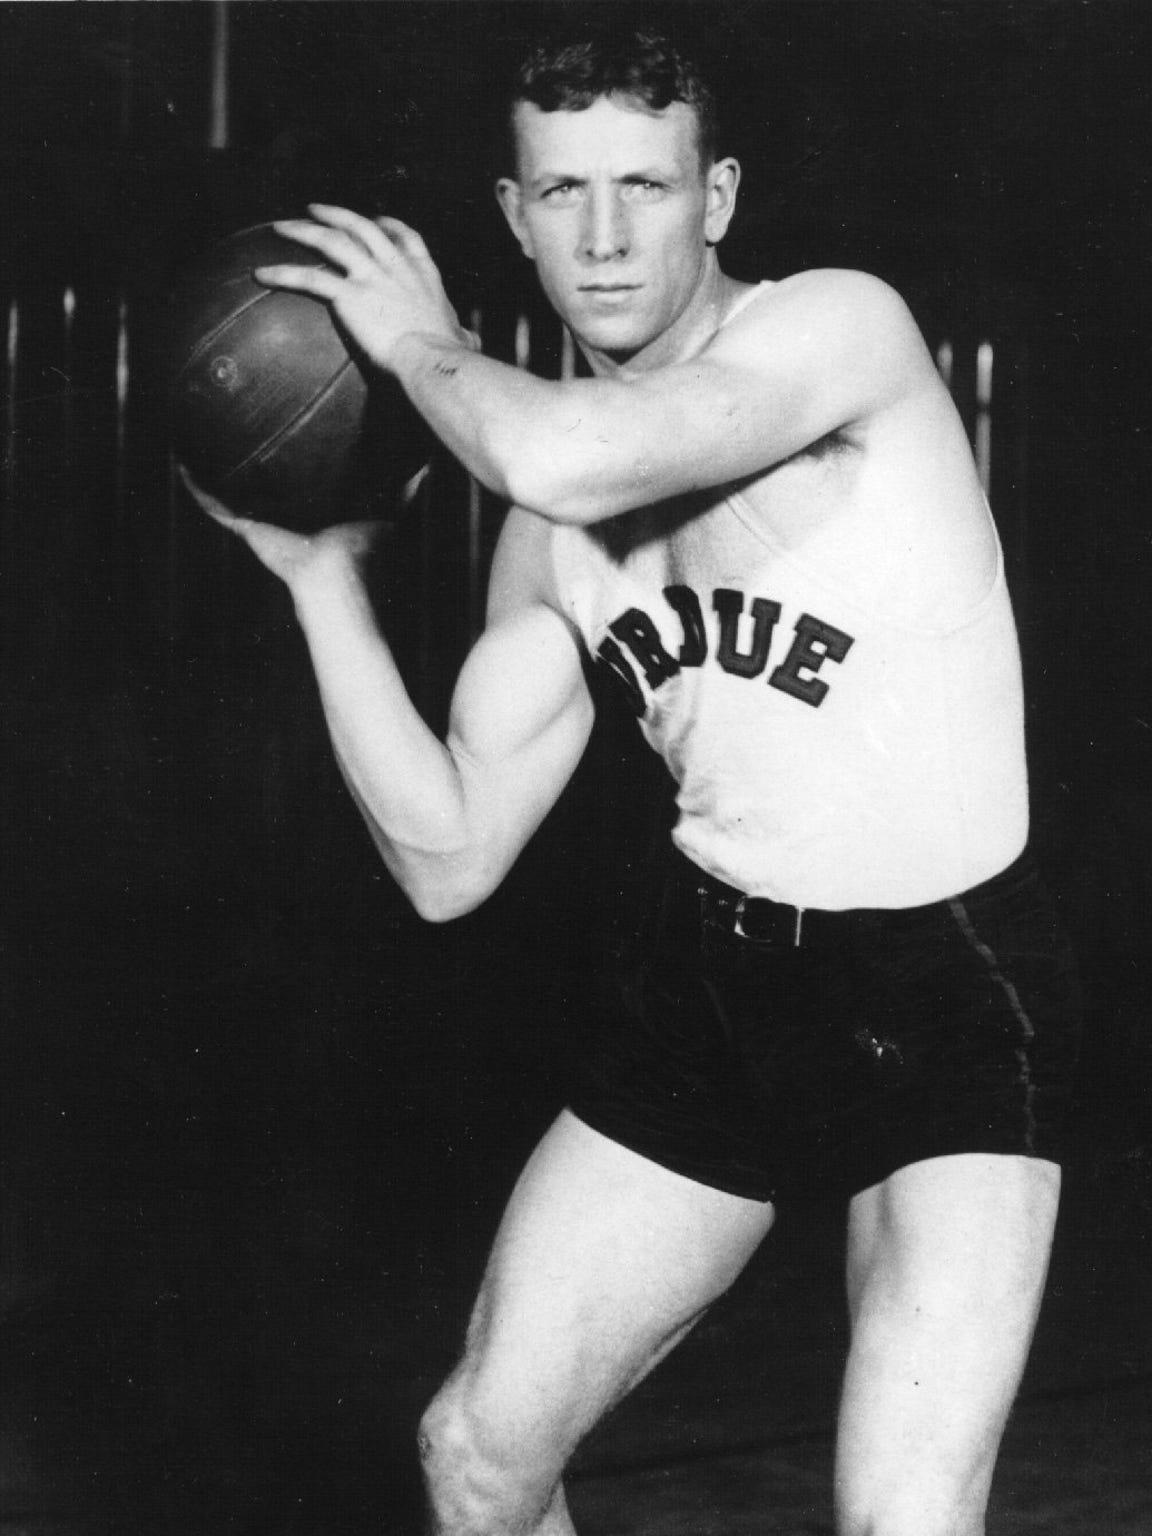 John Wooden at Purdue in 1931.